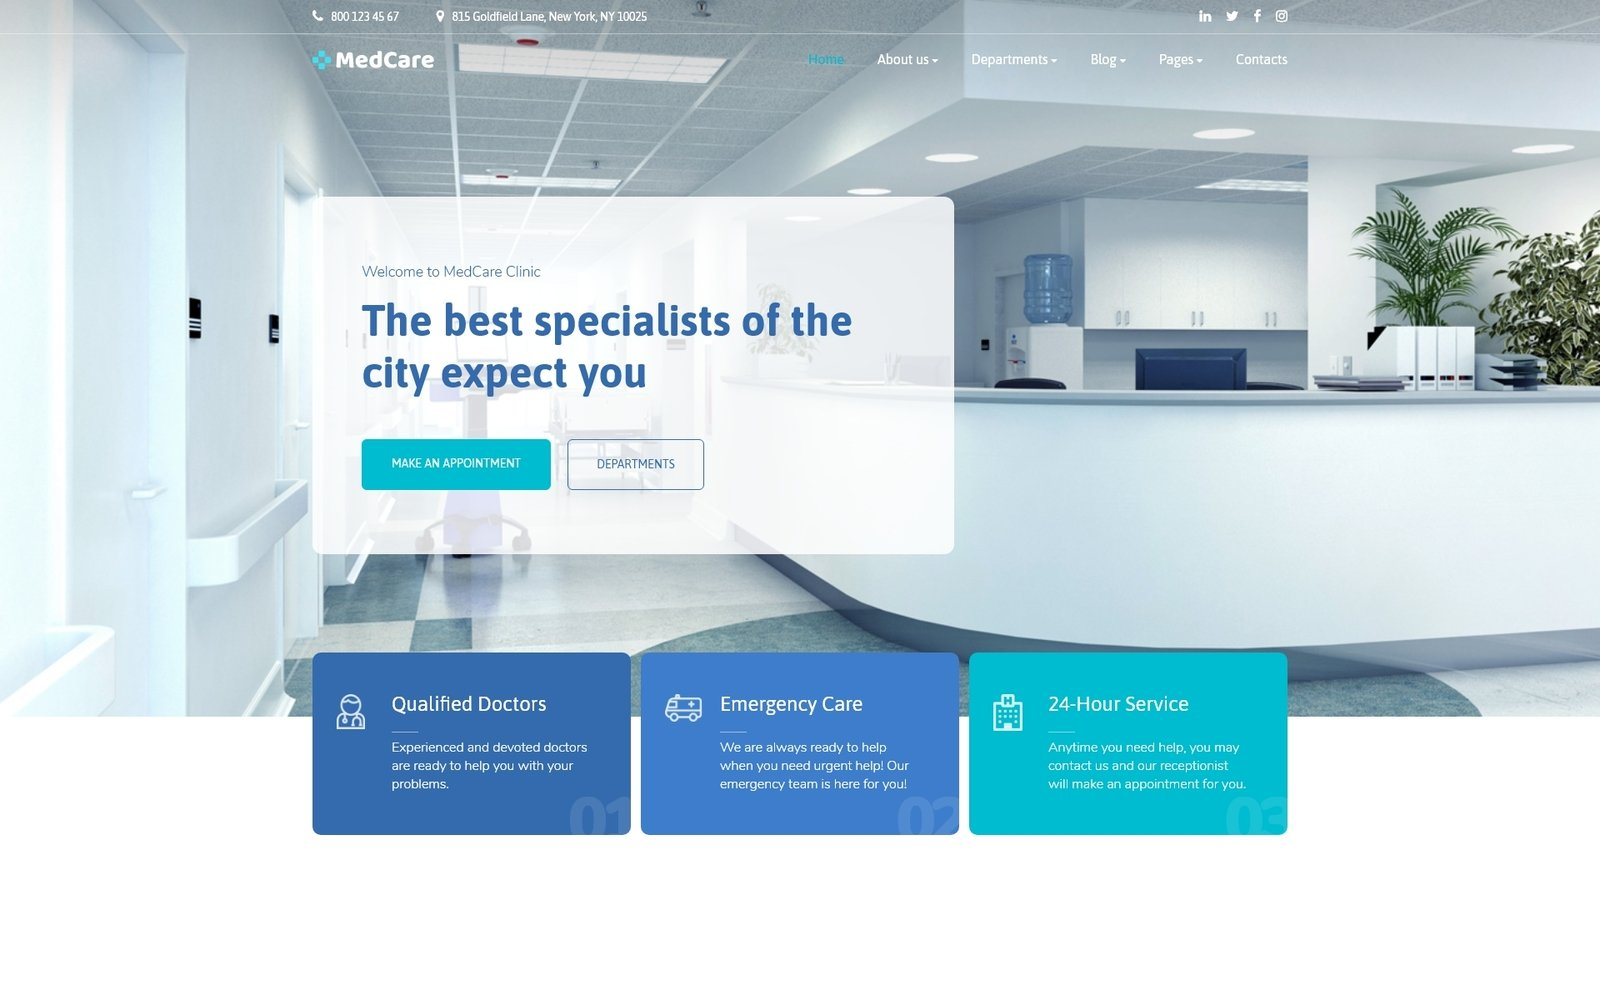 """MedCare - Healthcare Clinic"" 响应式网页模板 #90757 - 截图"